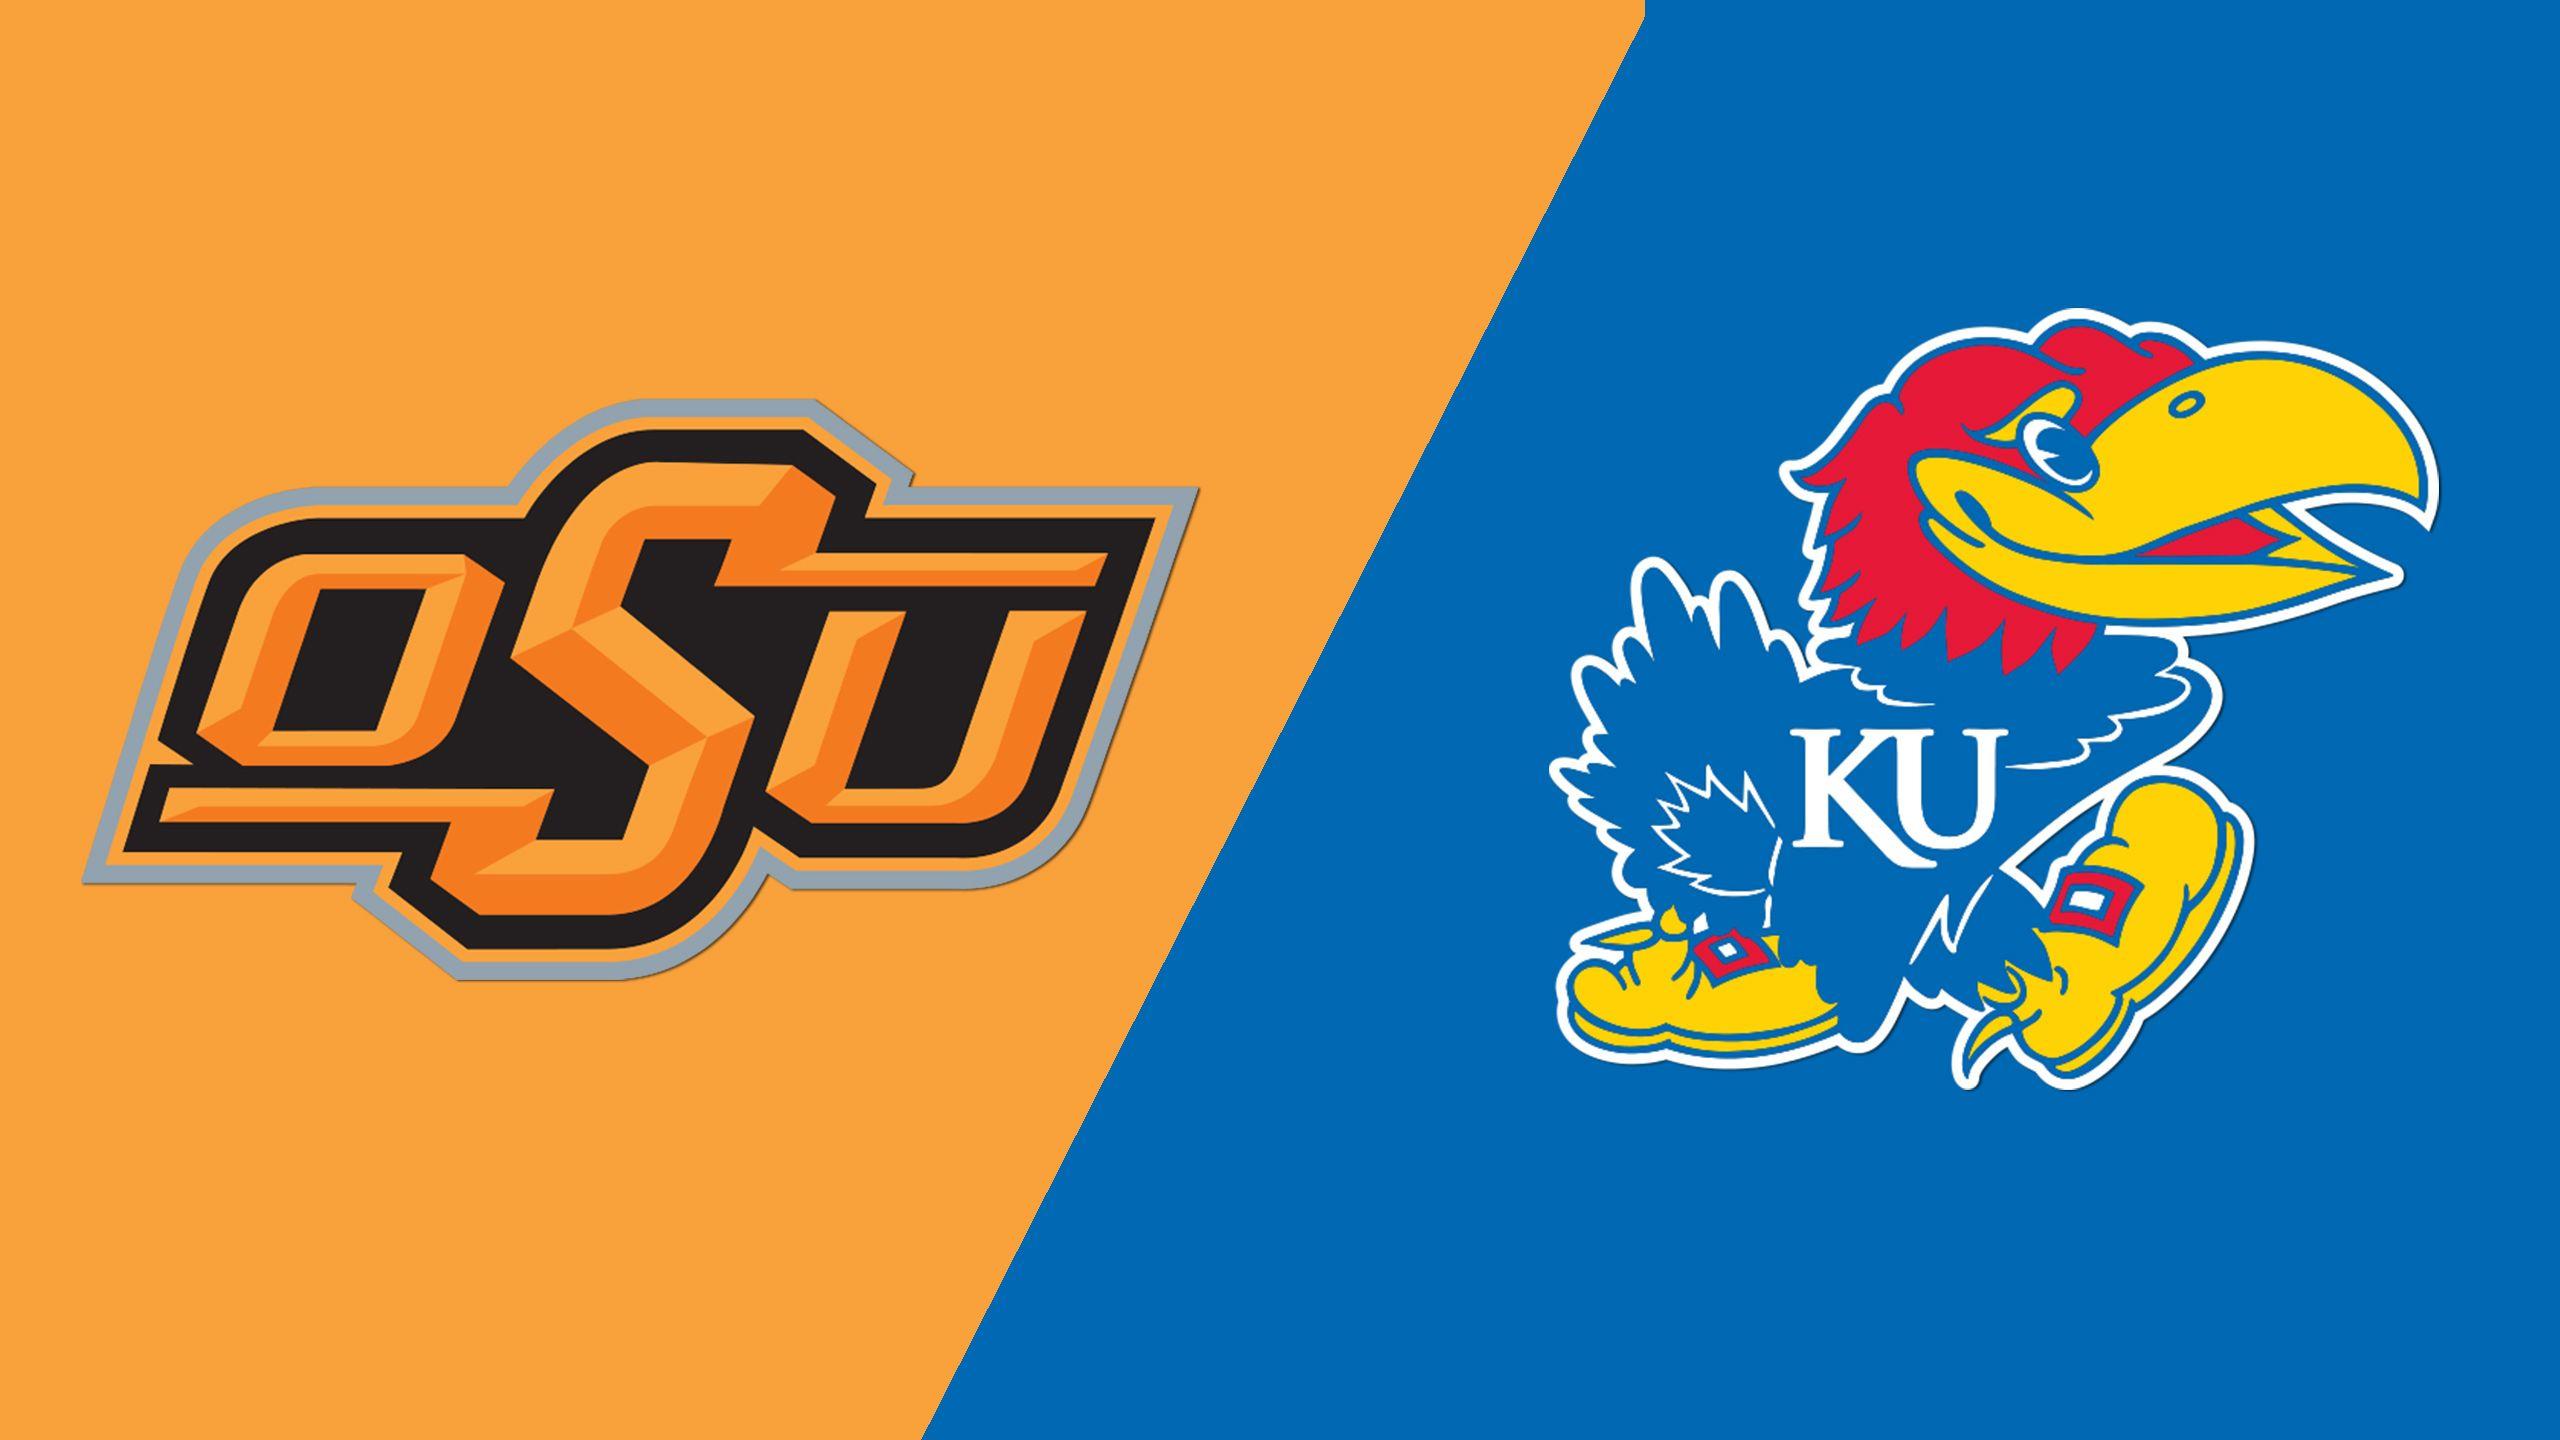 Oklahoma State vs. #9 Kansas (Quarterfinal #2) (Big 12 Men's Basketball Championship)